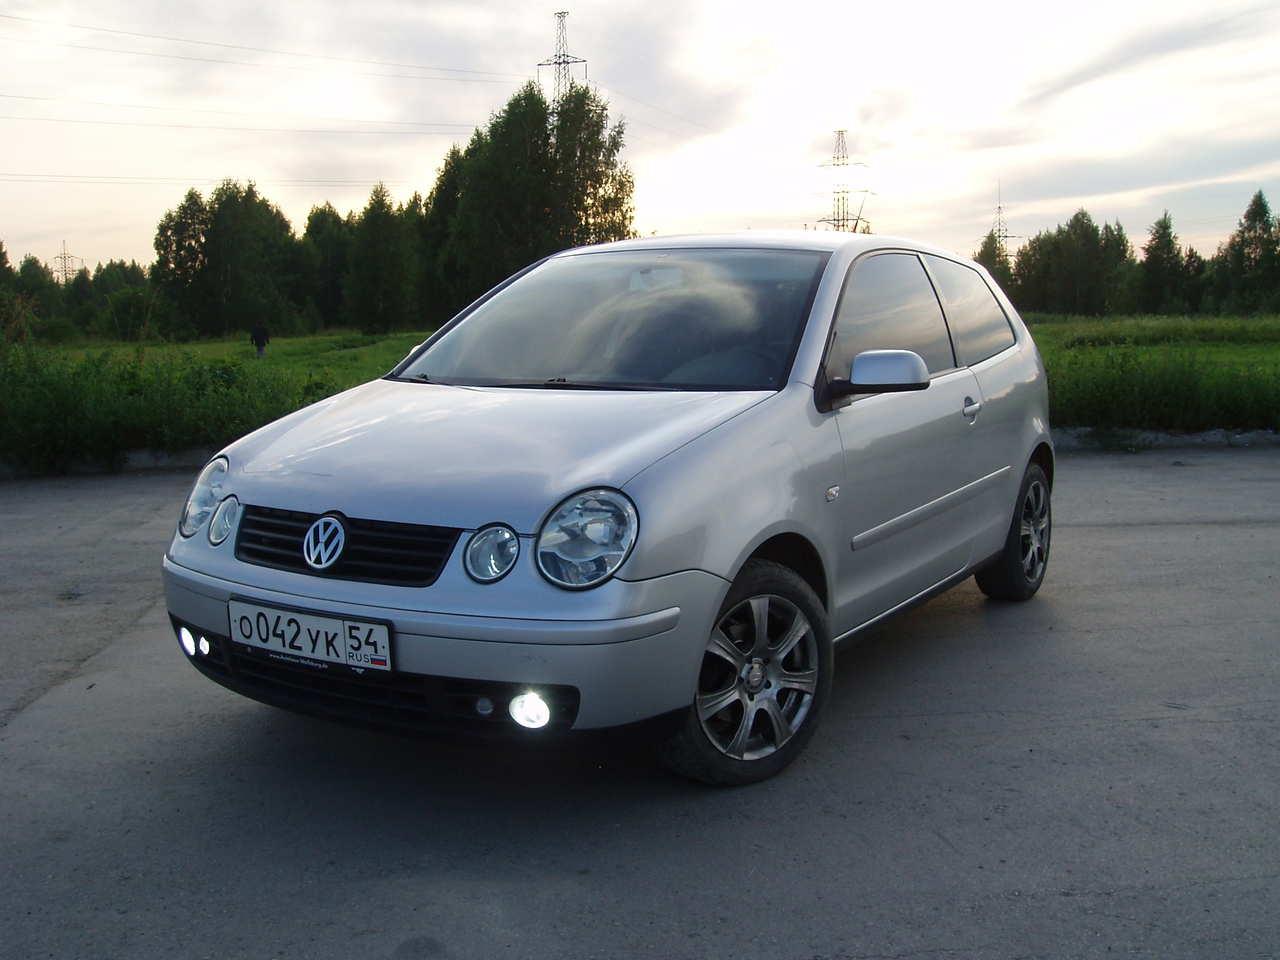 2002 Volkswagen Polo Specs  Engine Size 1 4  Fuel Type